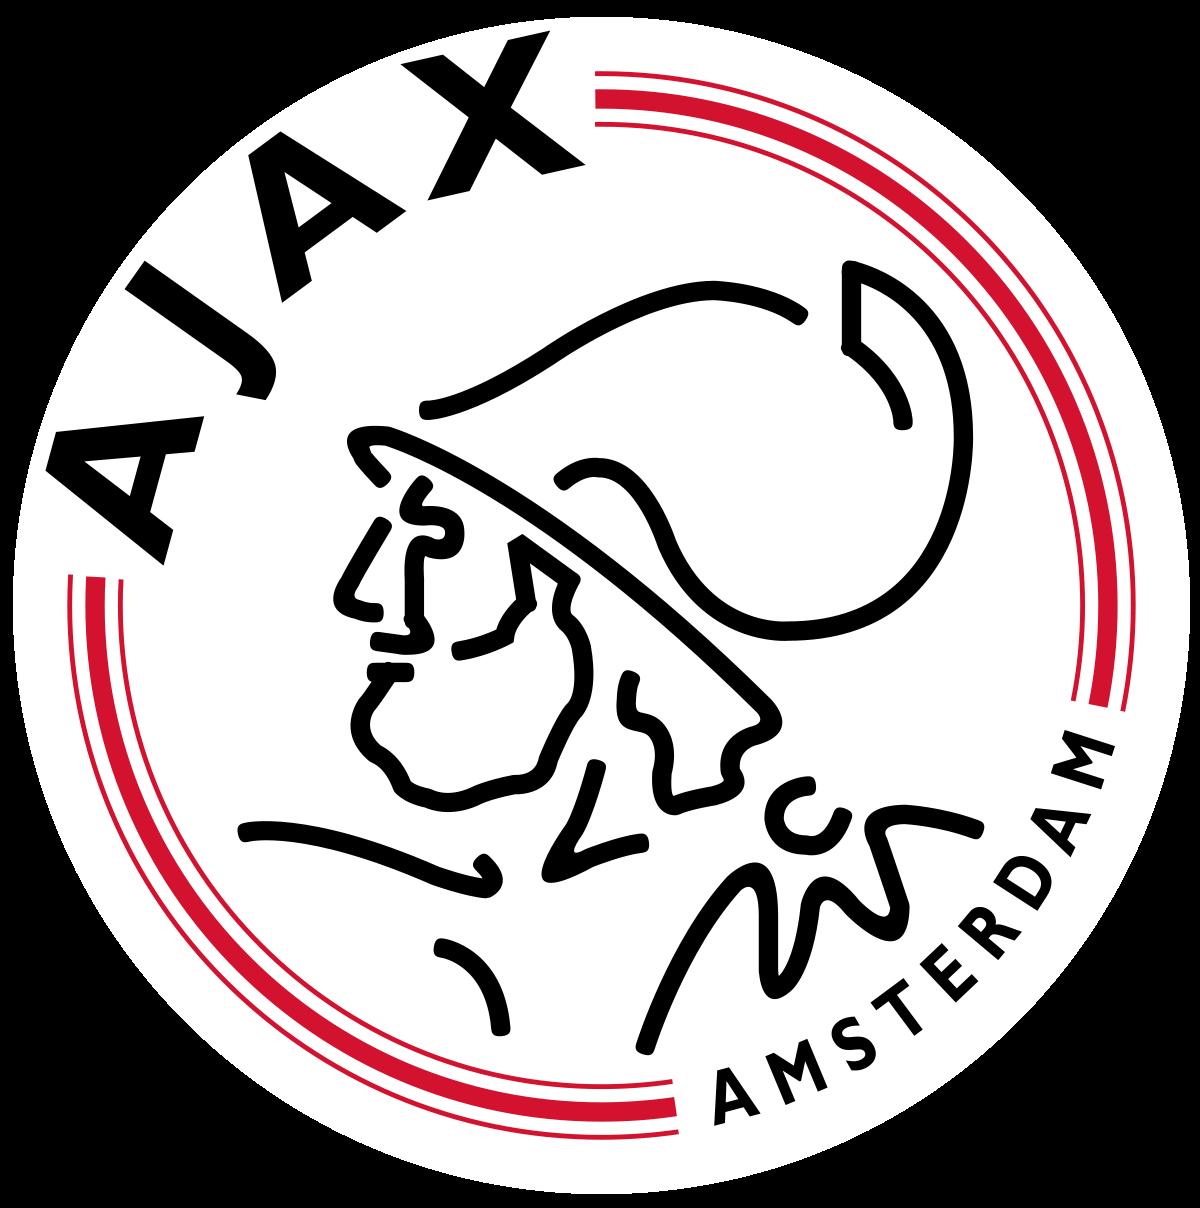 Herb Ajax Amsterdam